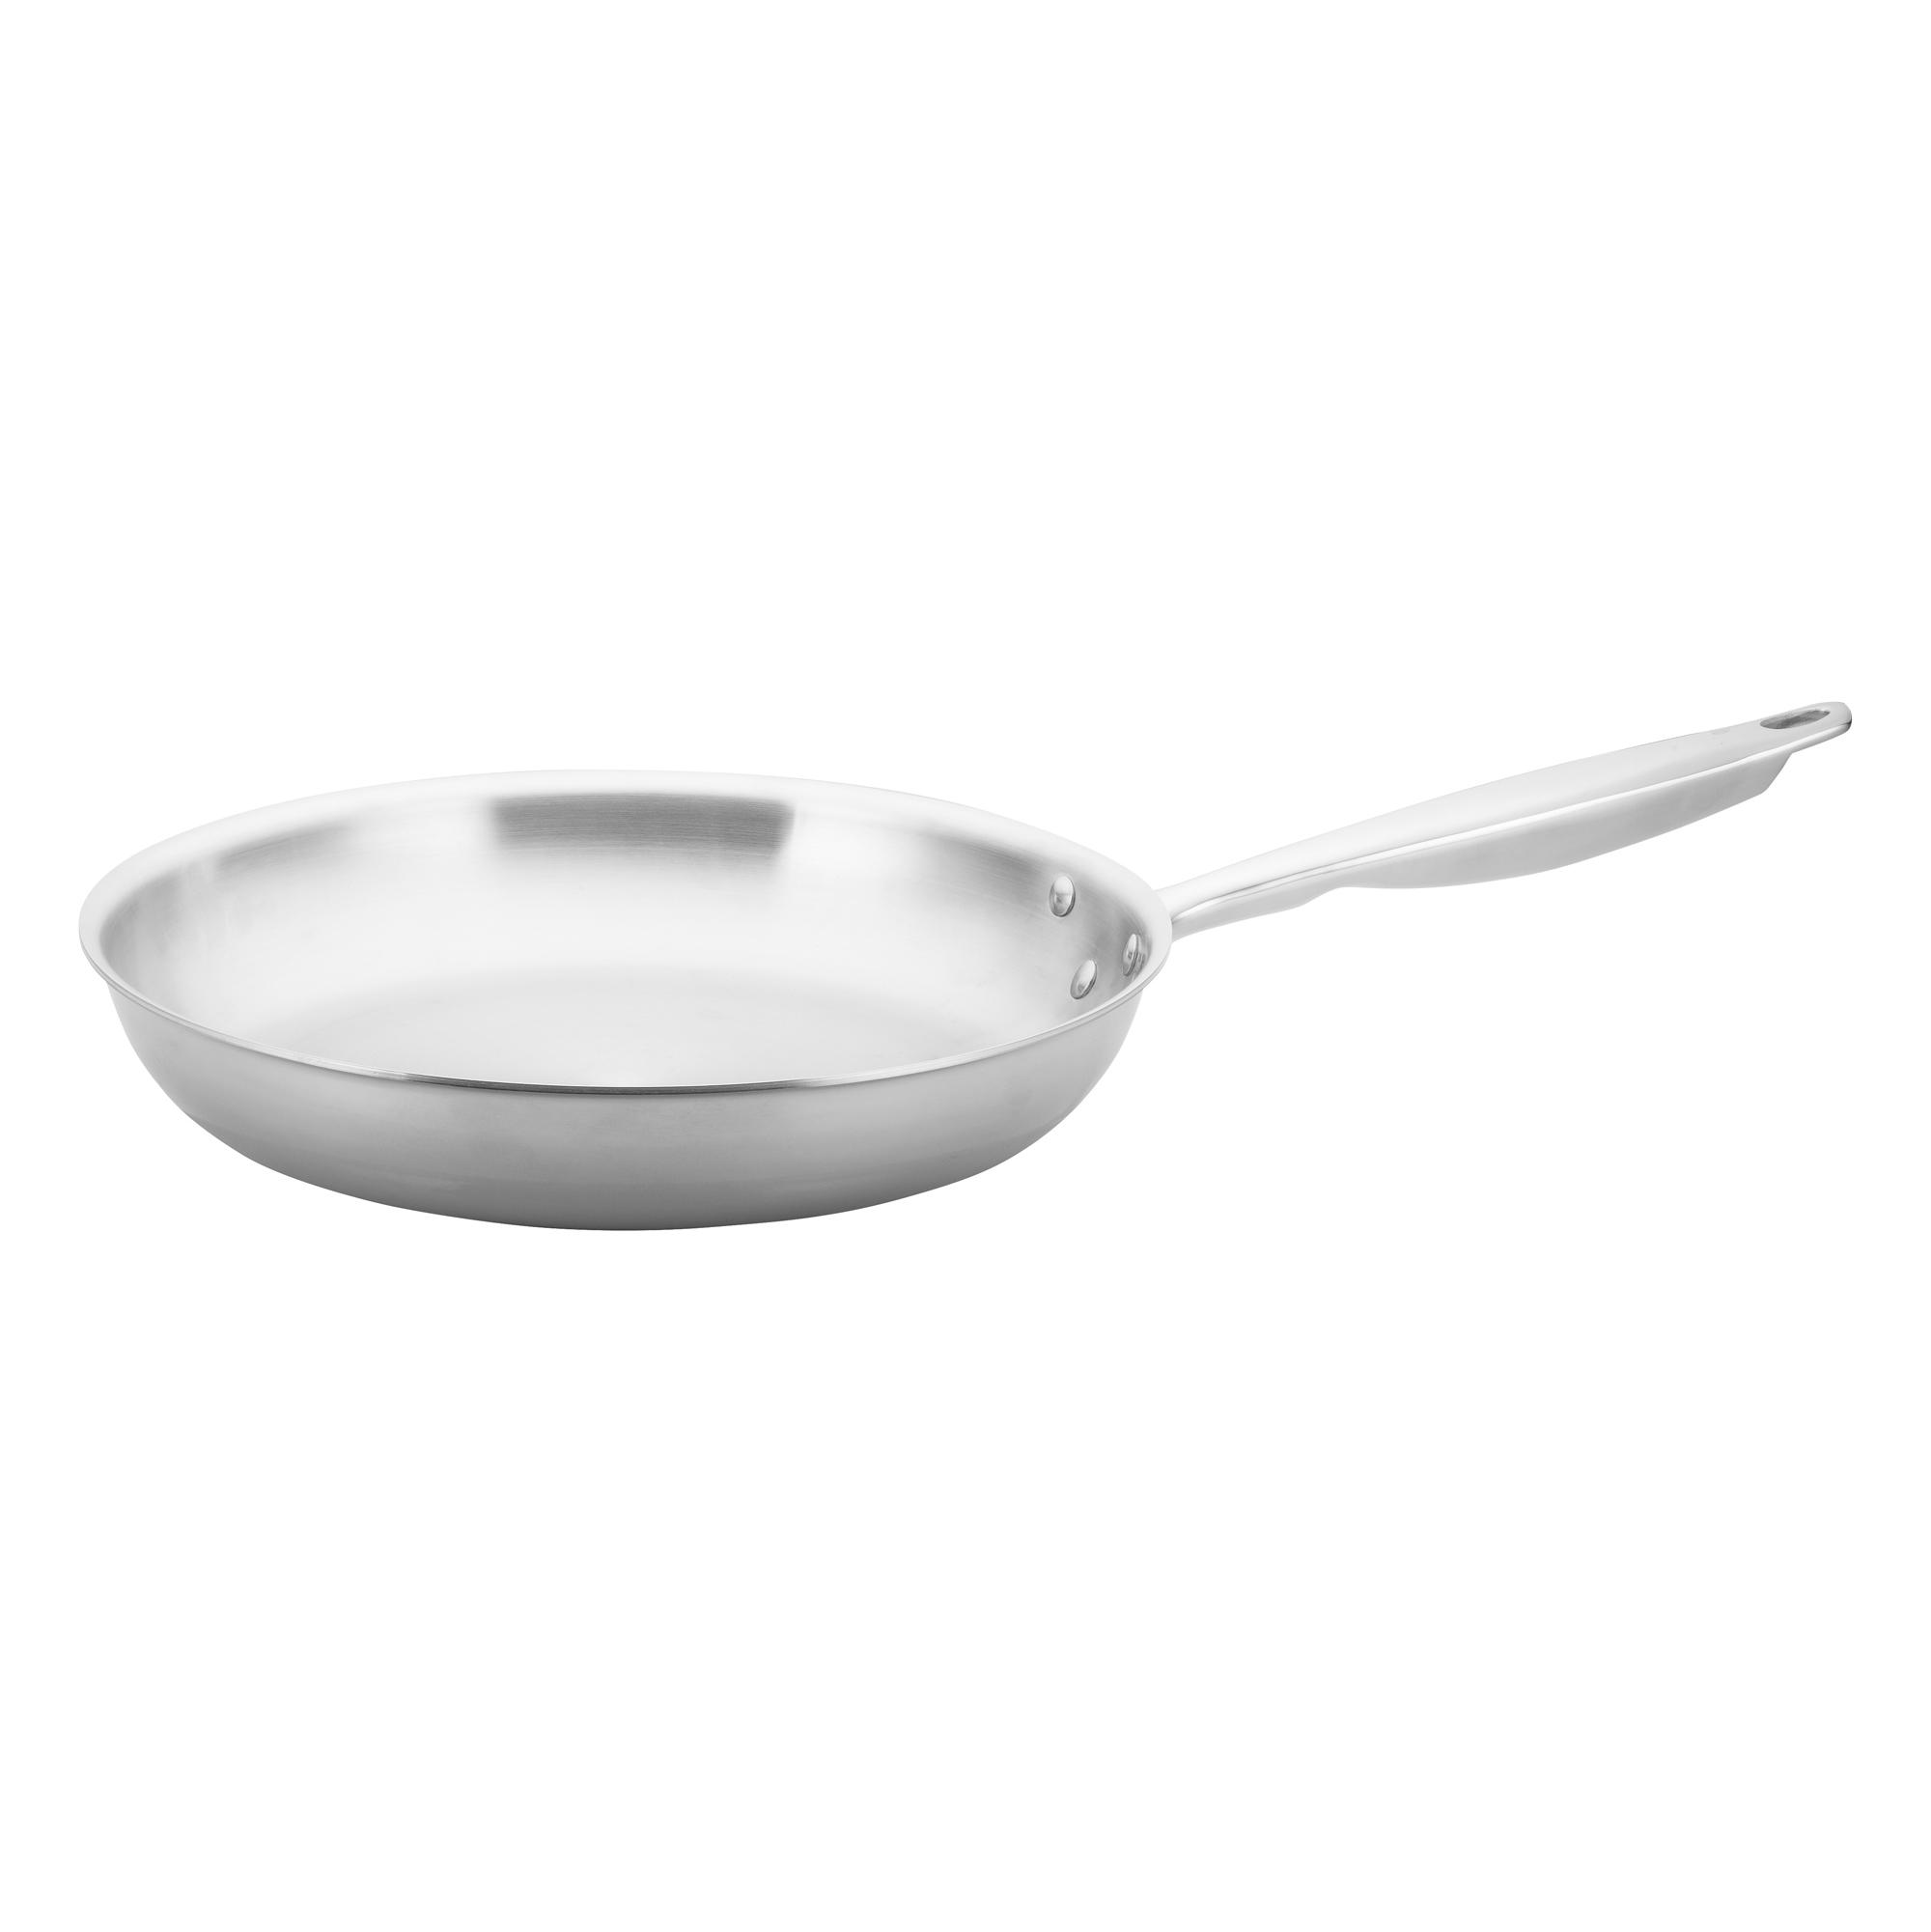 Winco TGFP-12 fry pan